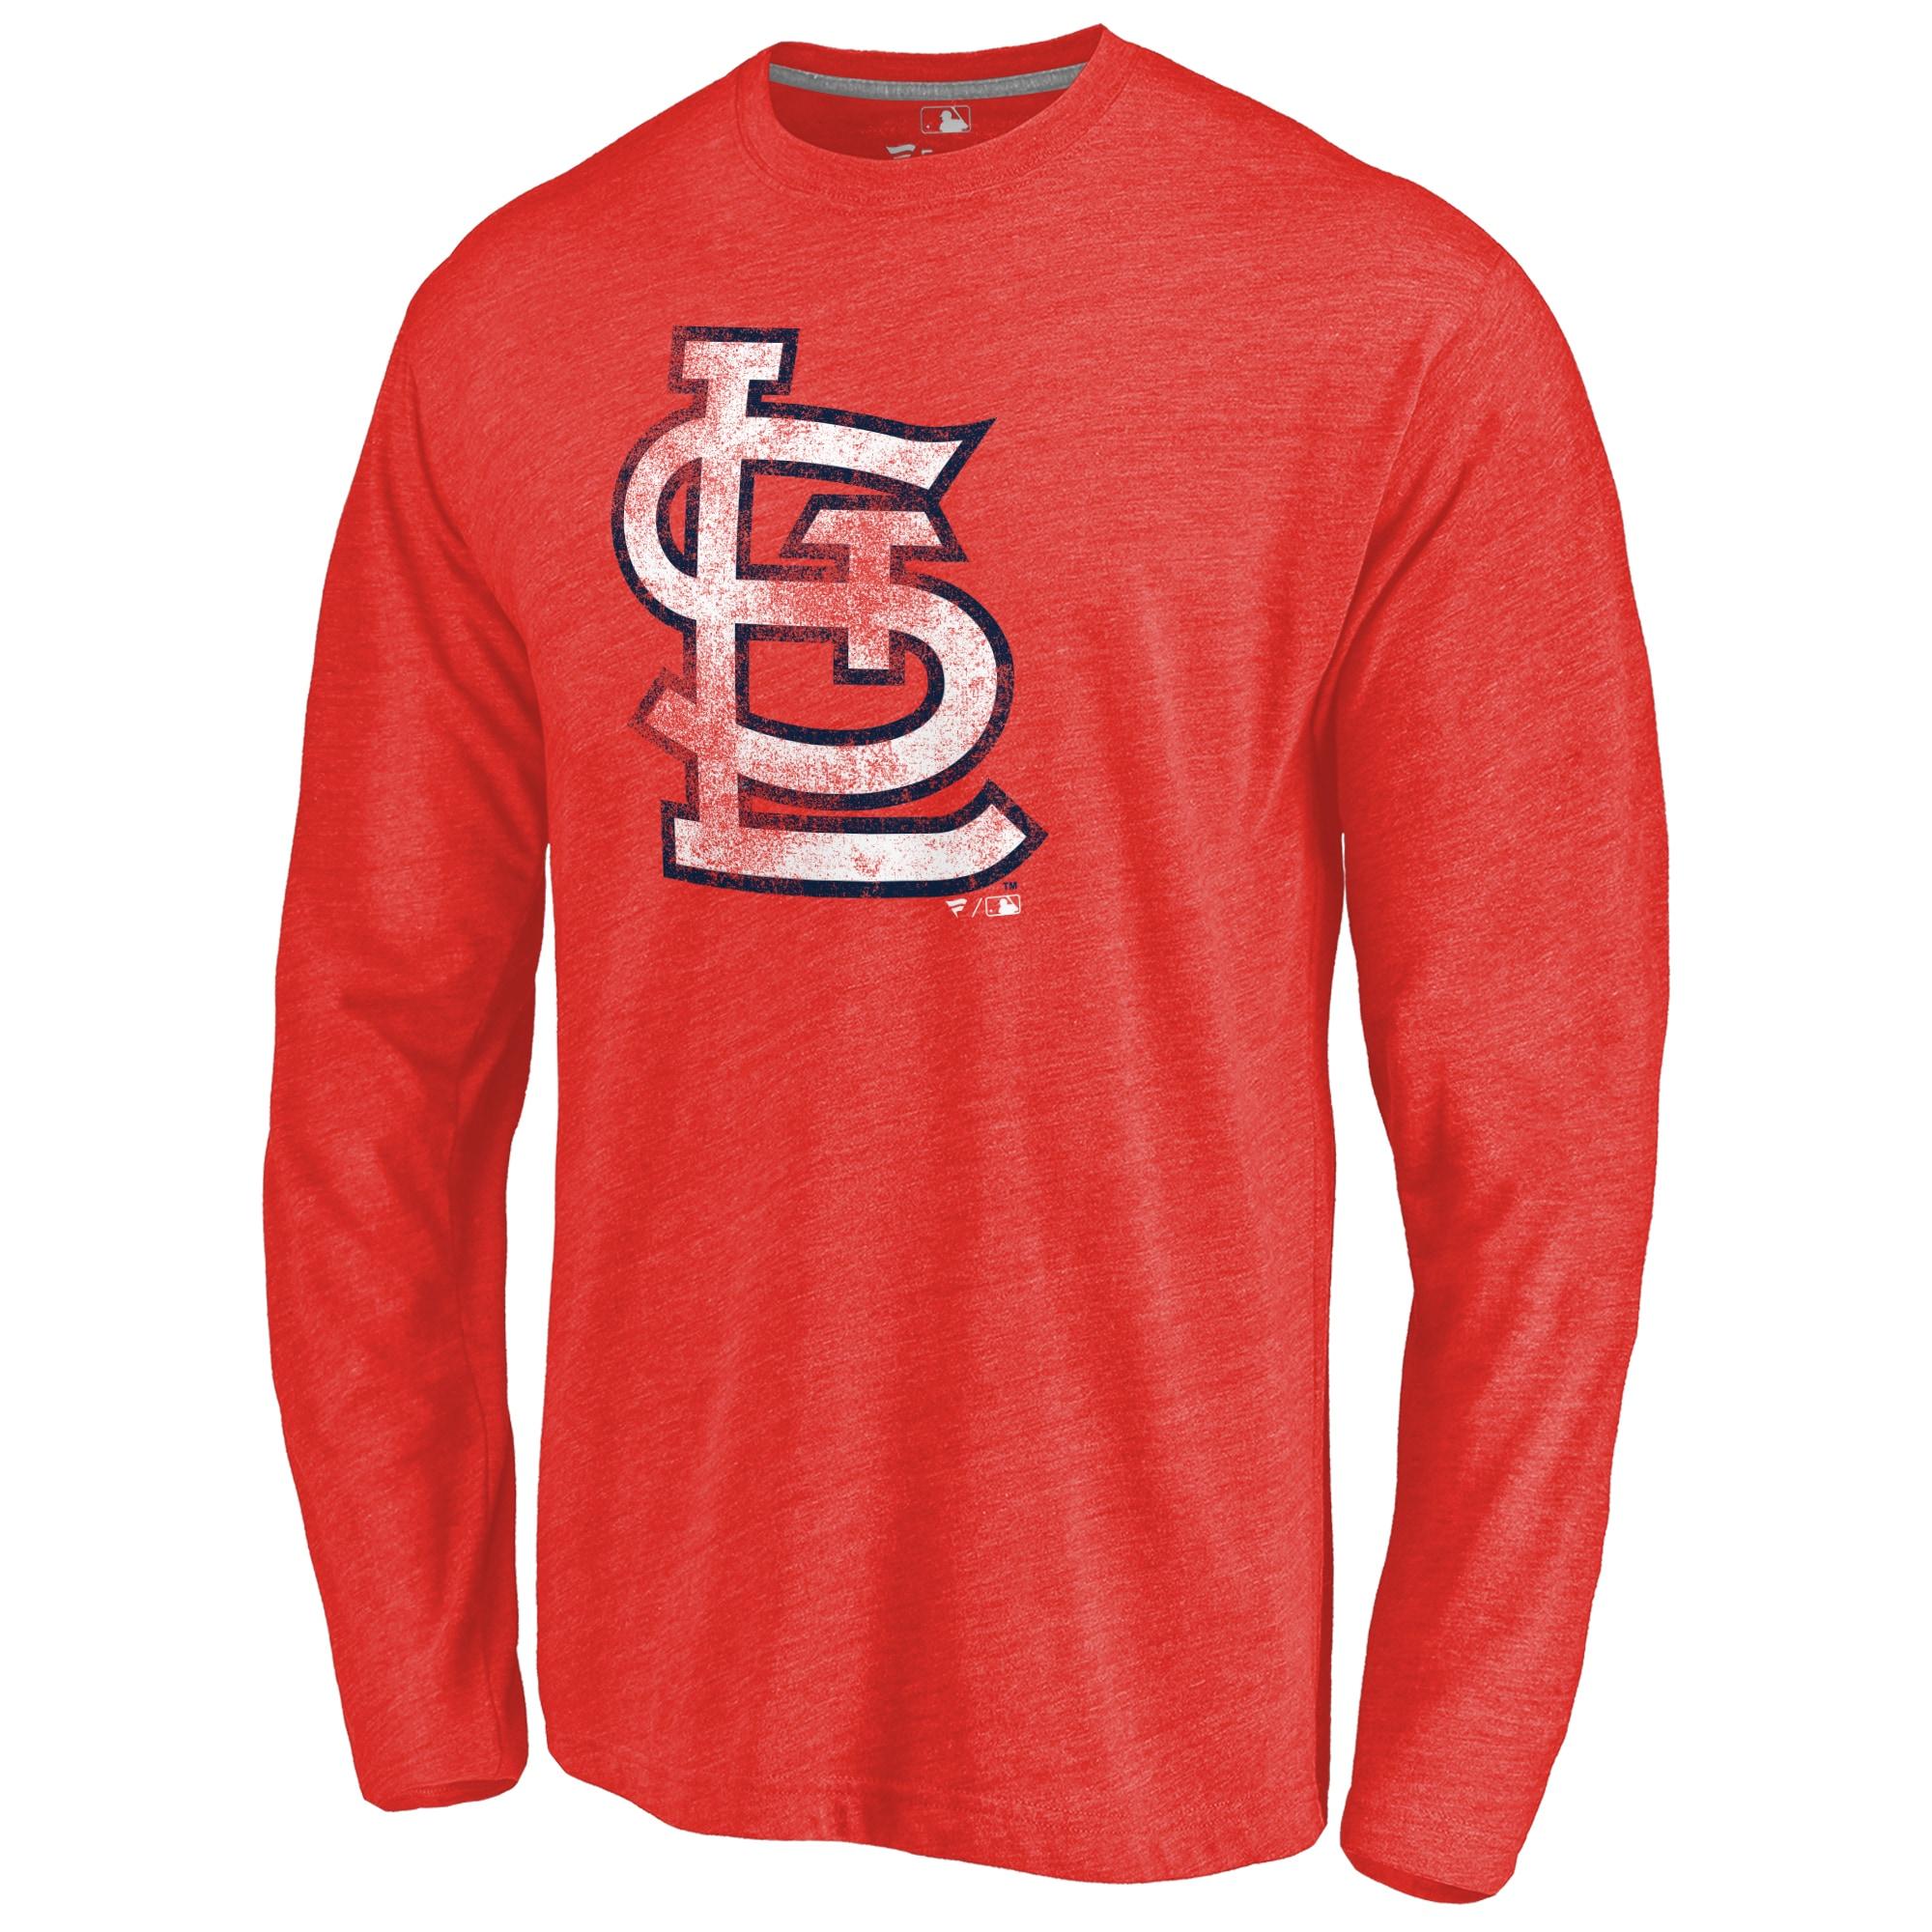 St. Louis Cardinals Distressed Team Long Sleeve Tri-Blend T-shirt - Red